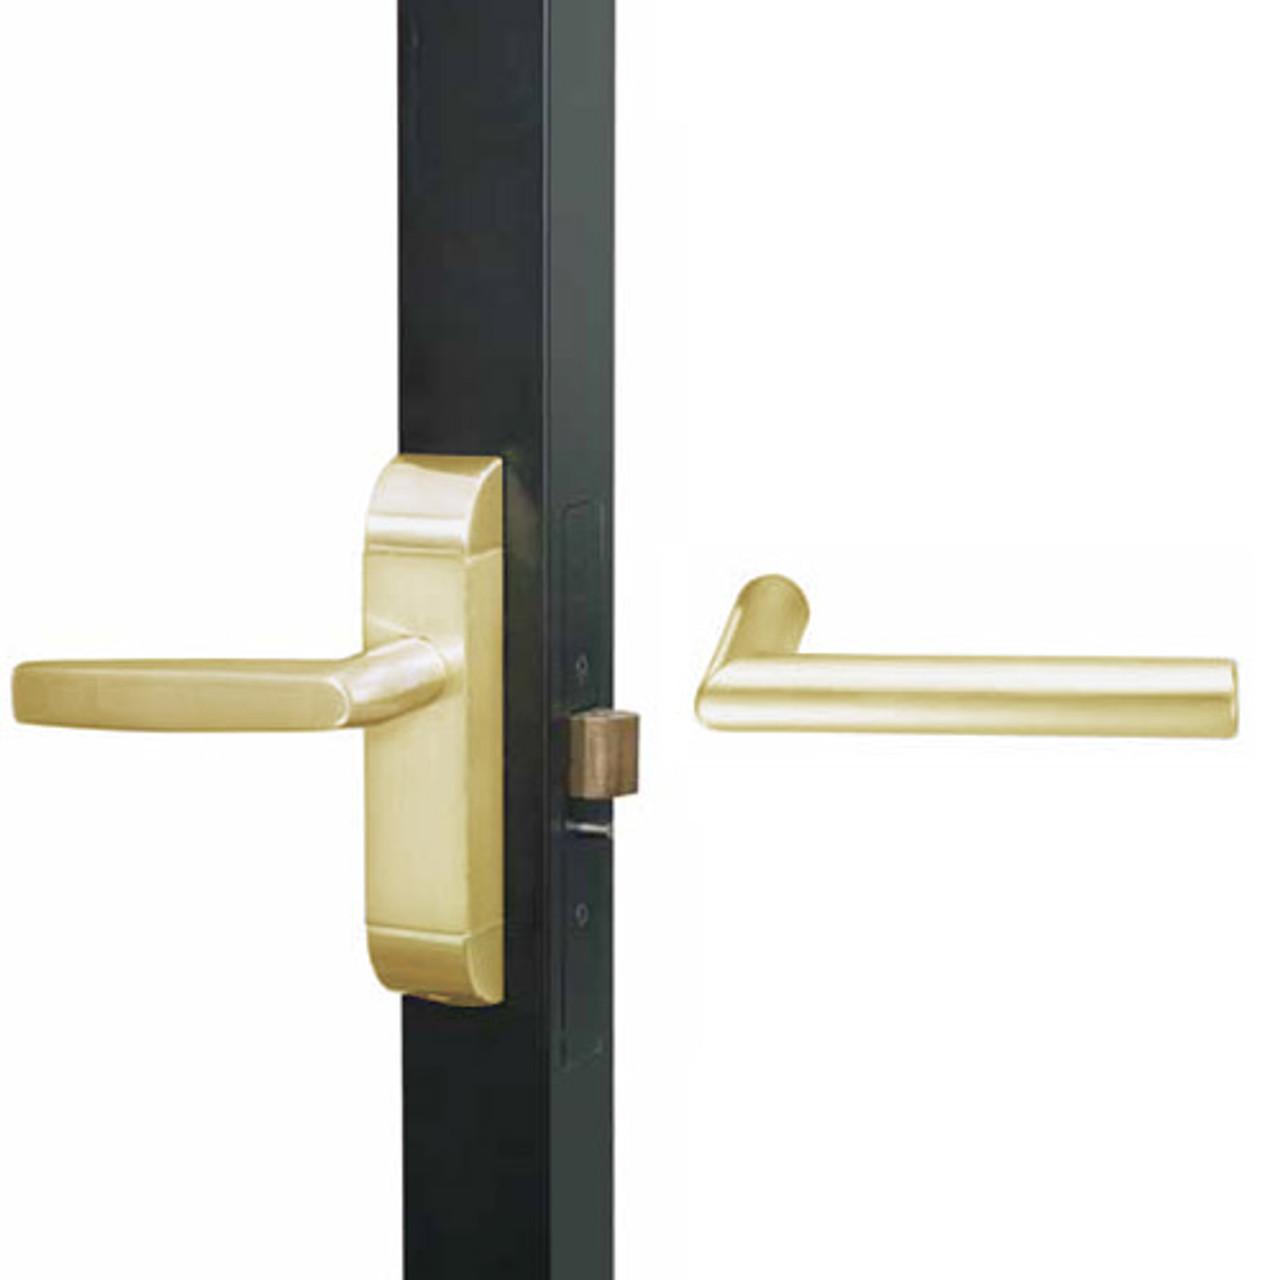 4600-MI-511-US4 Adams Rite MI Designer Deadlatch handle in Satin Brass Finish